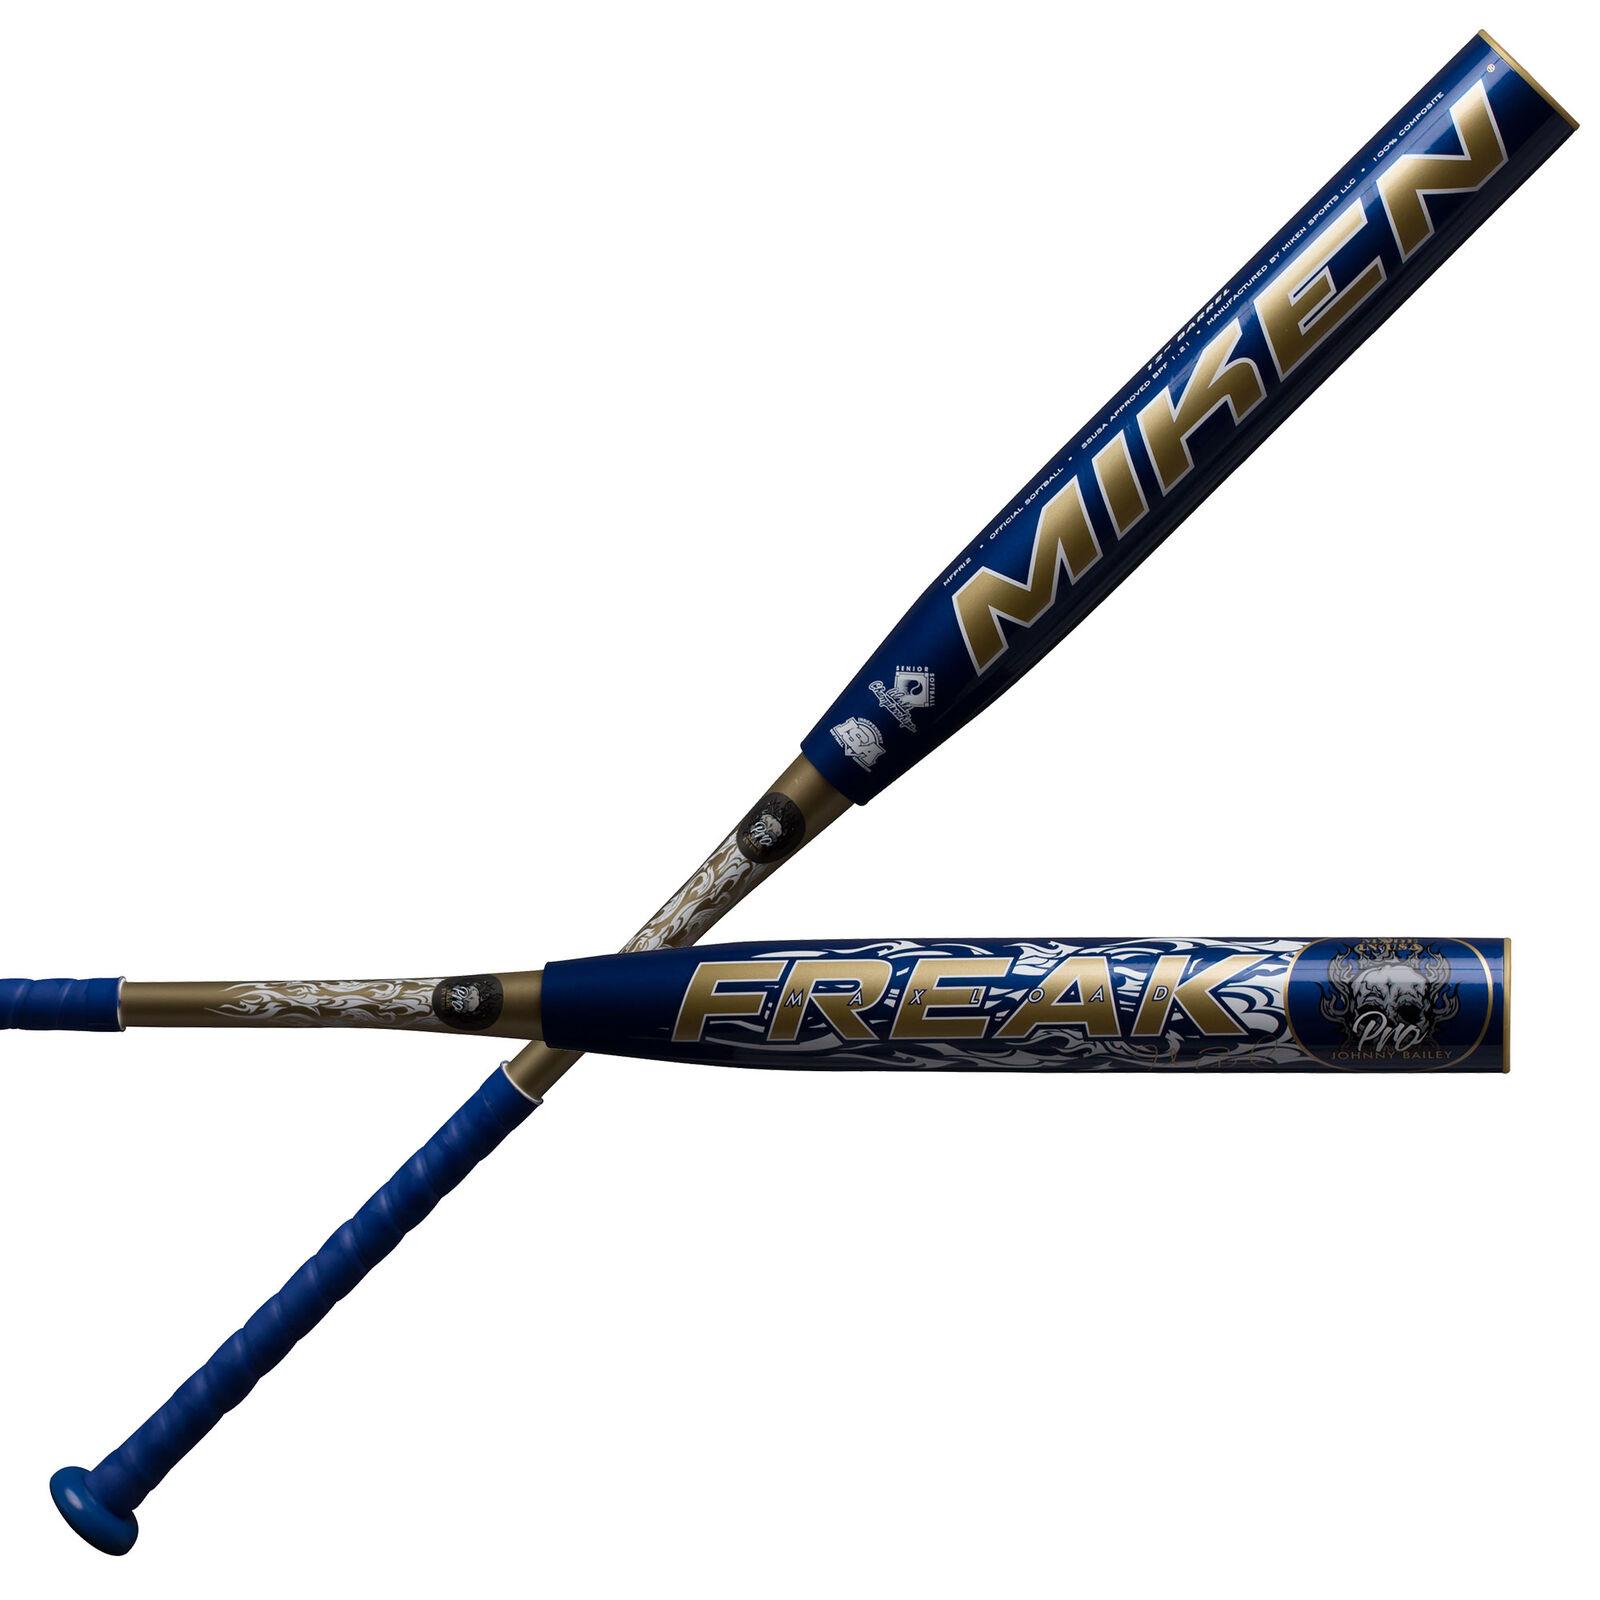 Miken Freak Pro Johnny Bailey MaxLoad MFPR12 Senior Slowpitch Softball Bat Bat Softball 34/28 b20072